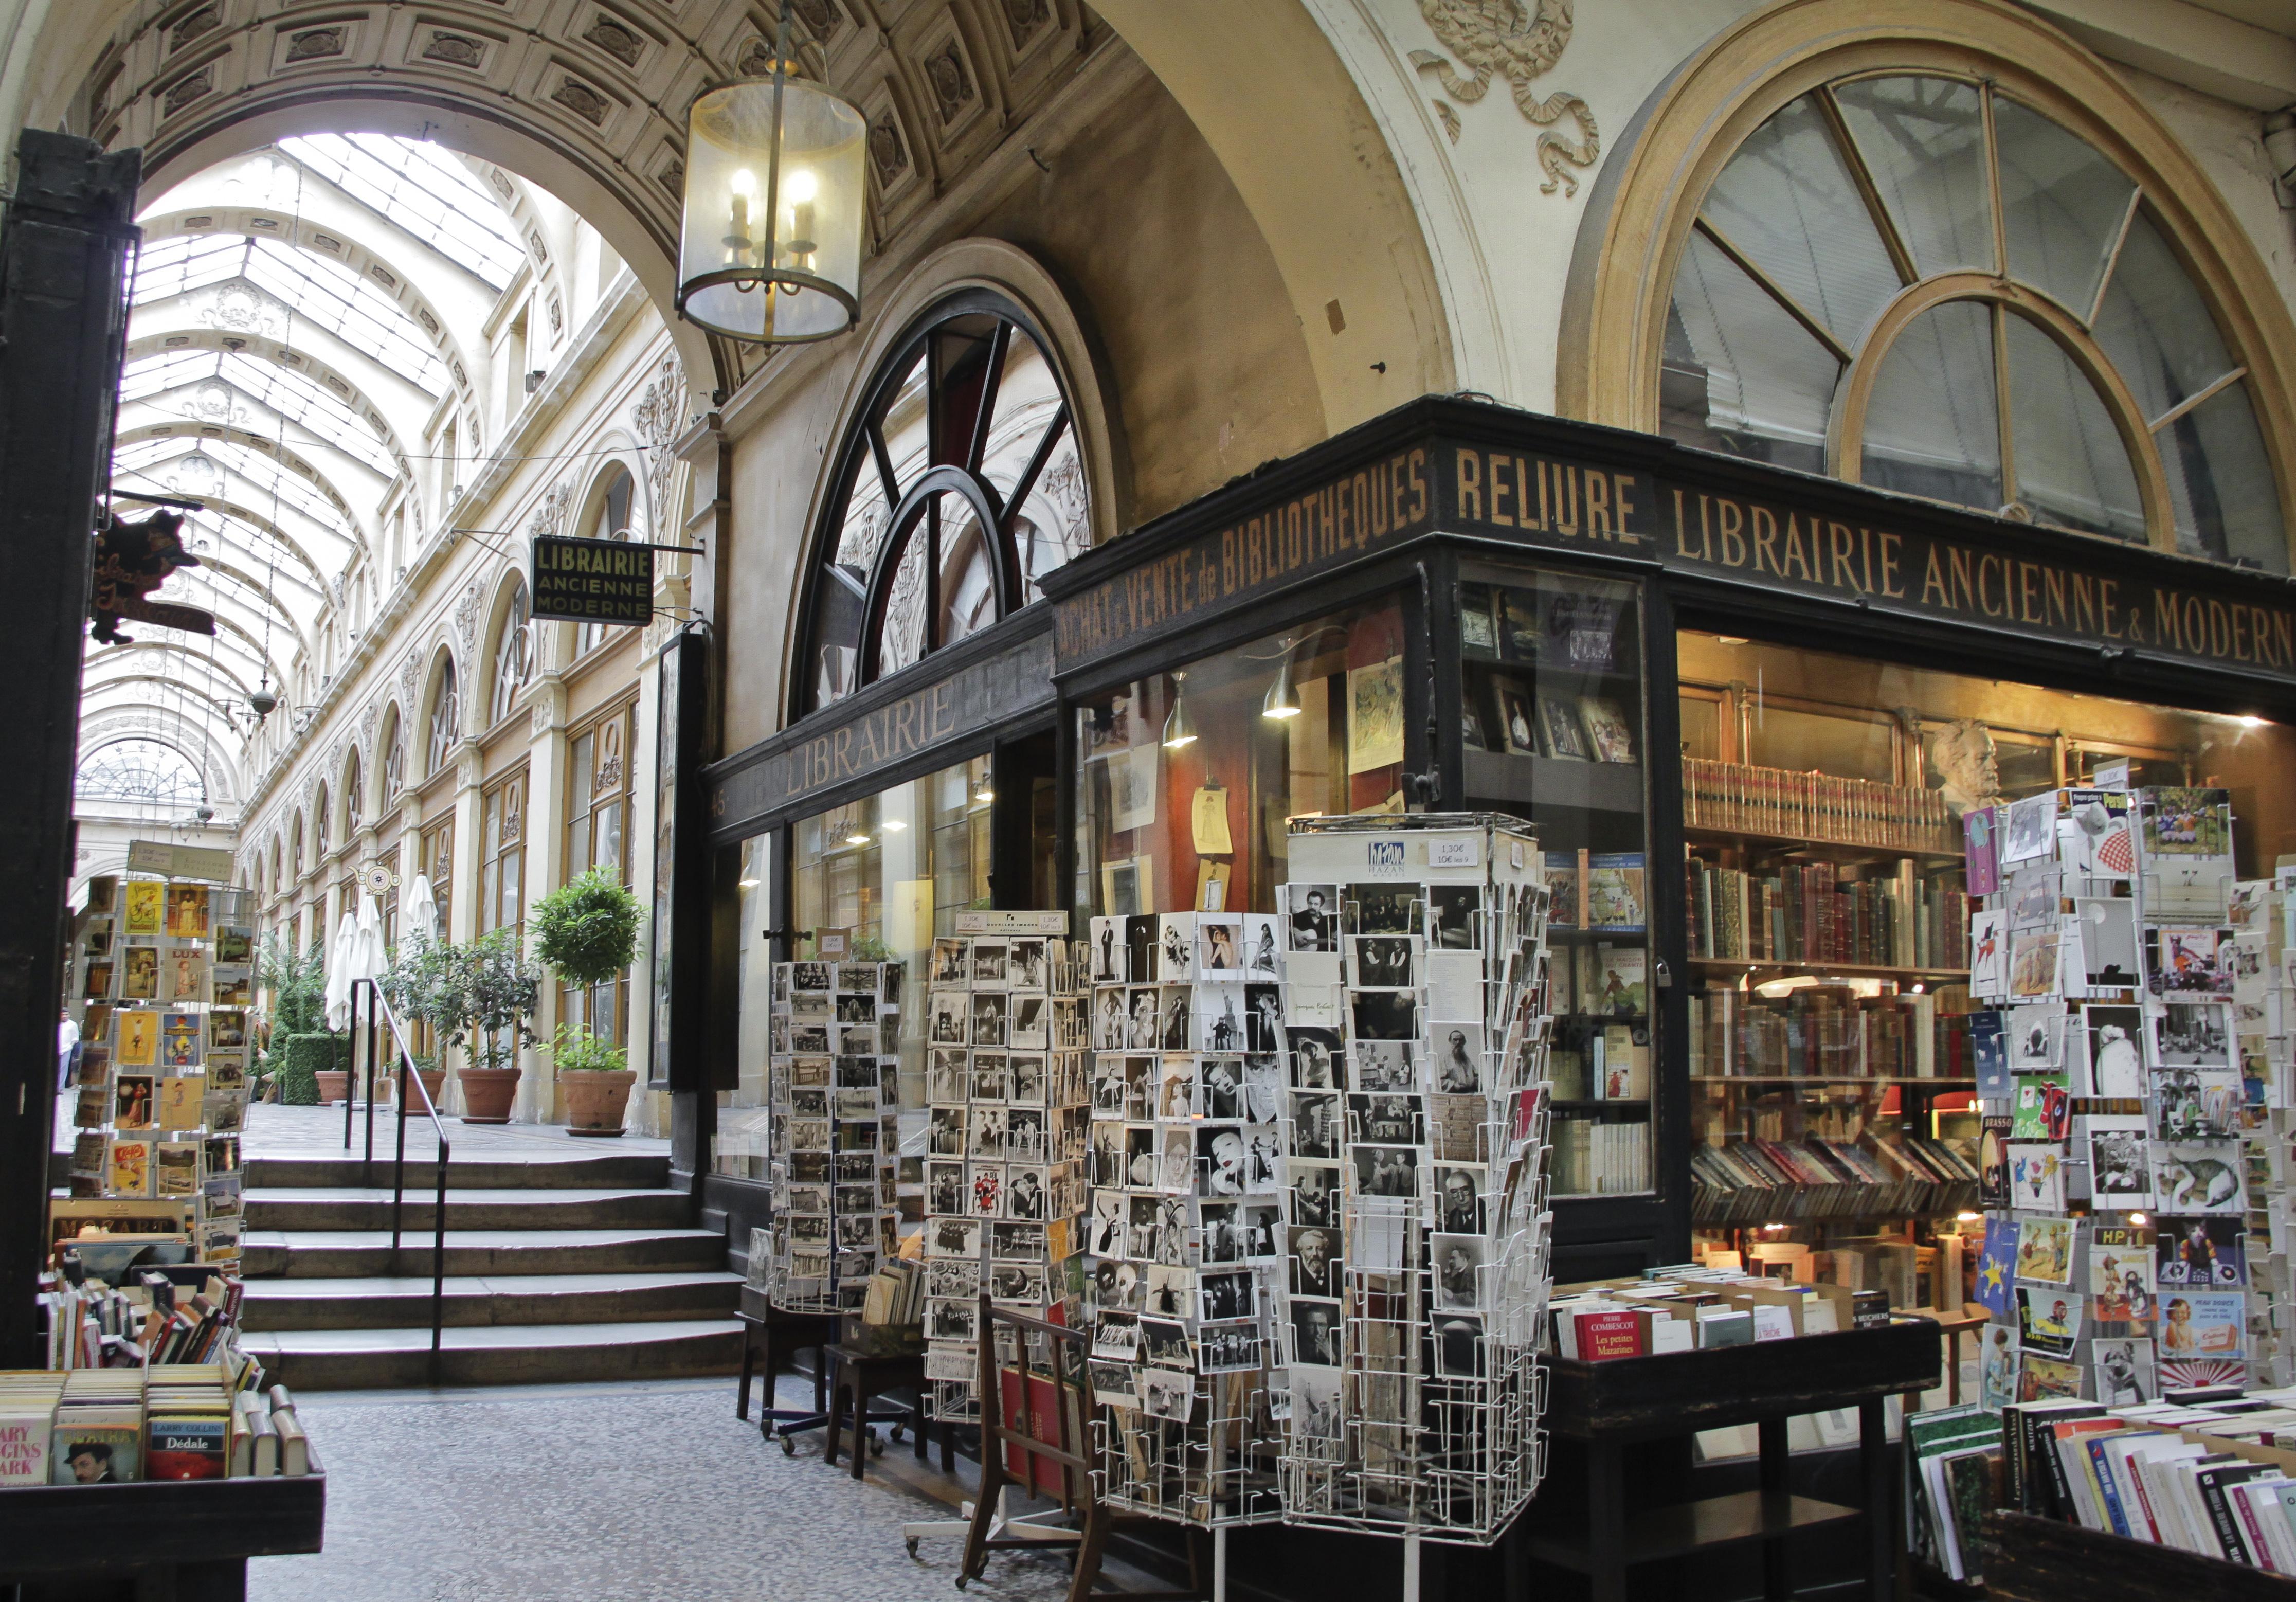 Galerie Vivienne - Book shop